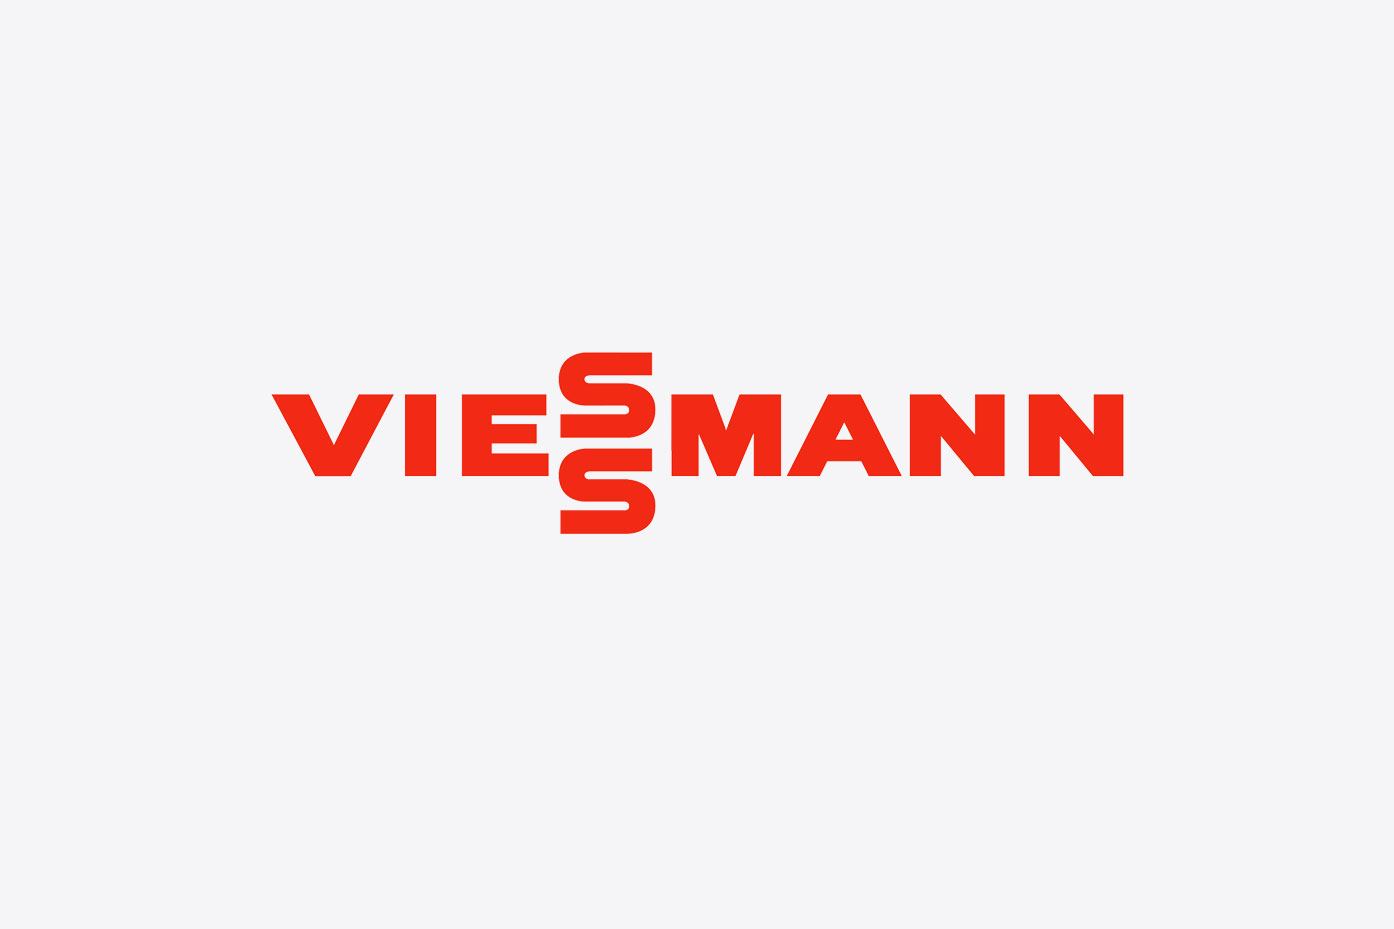 Étude de cas : Viessmann